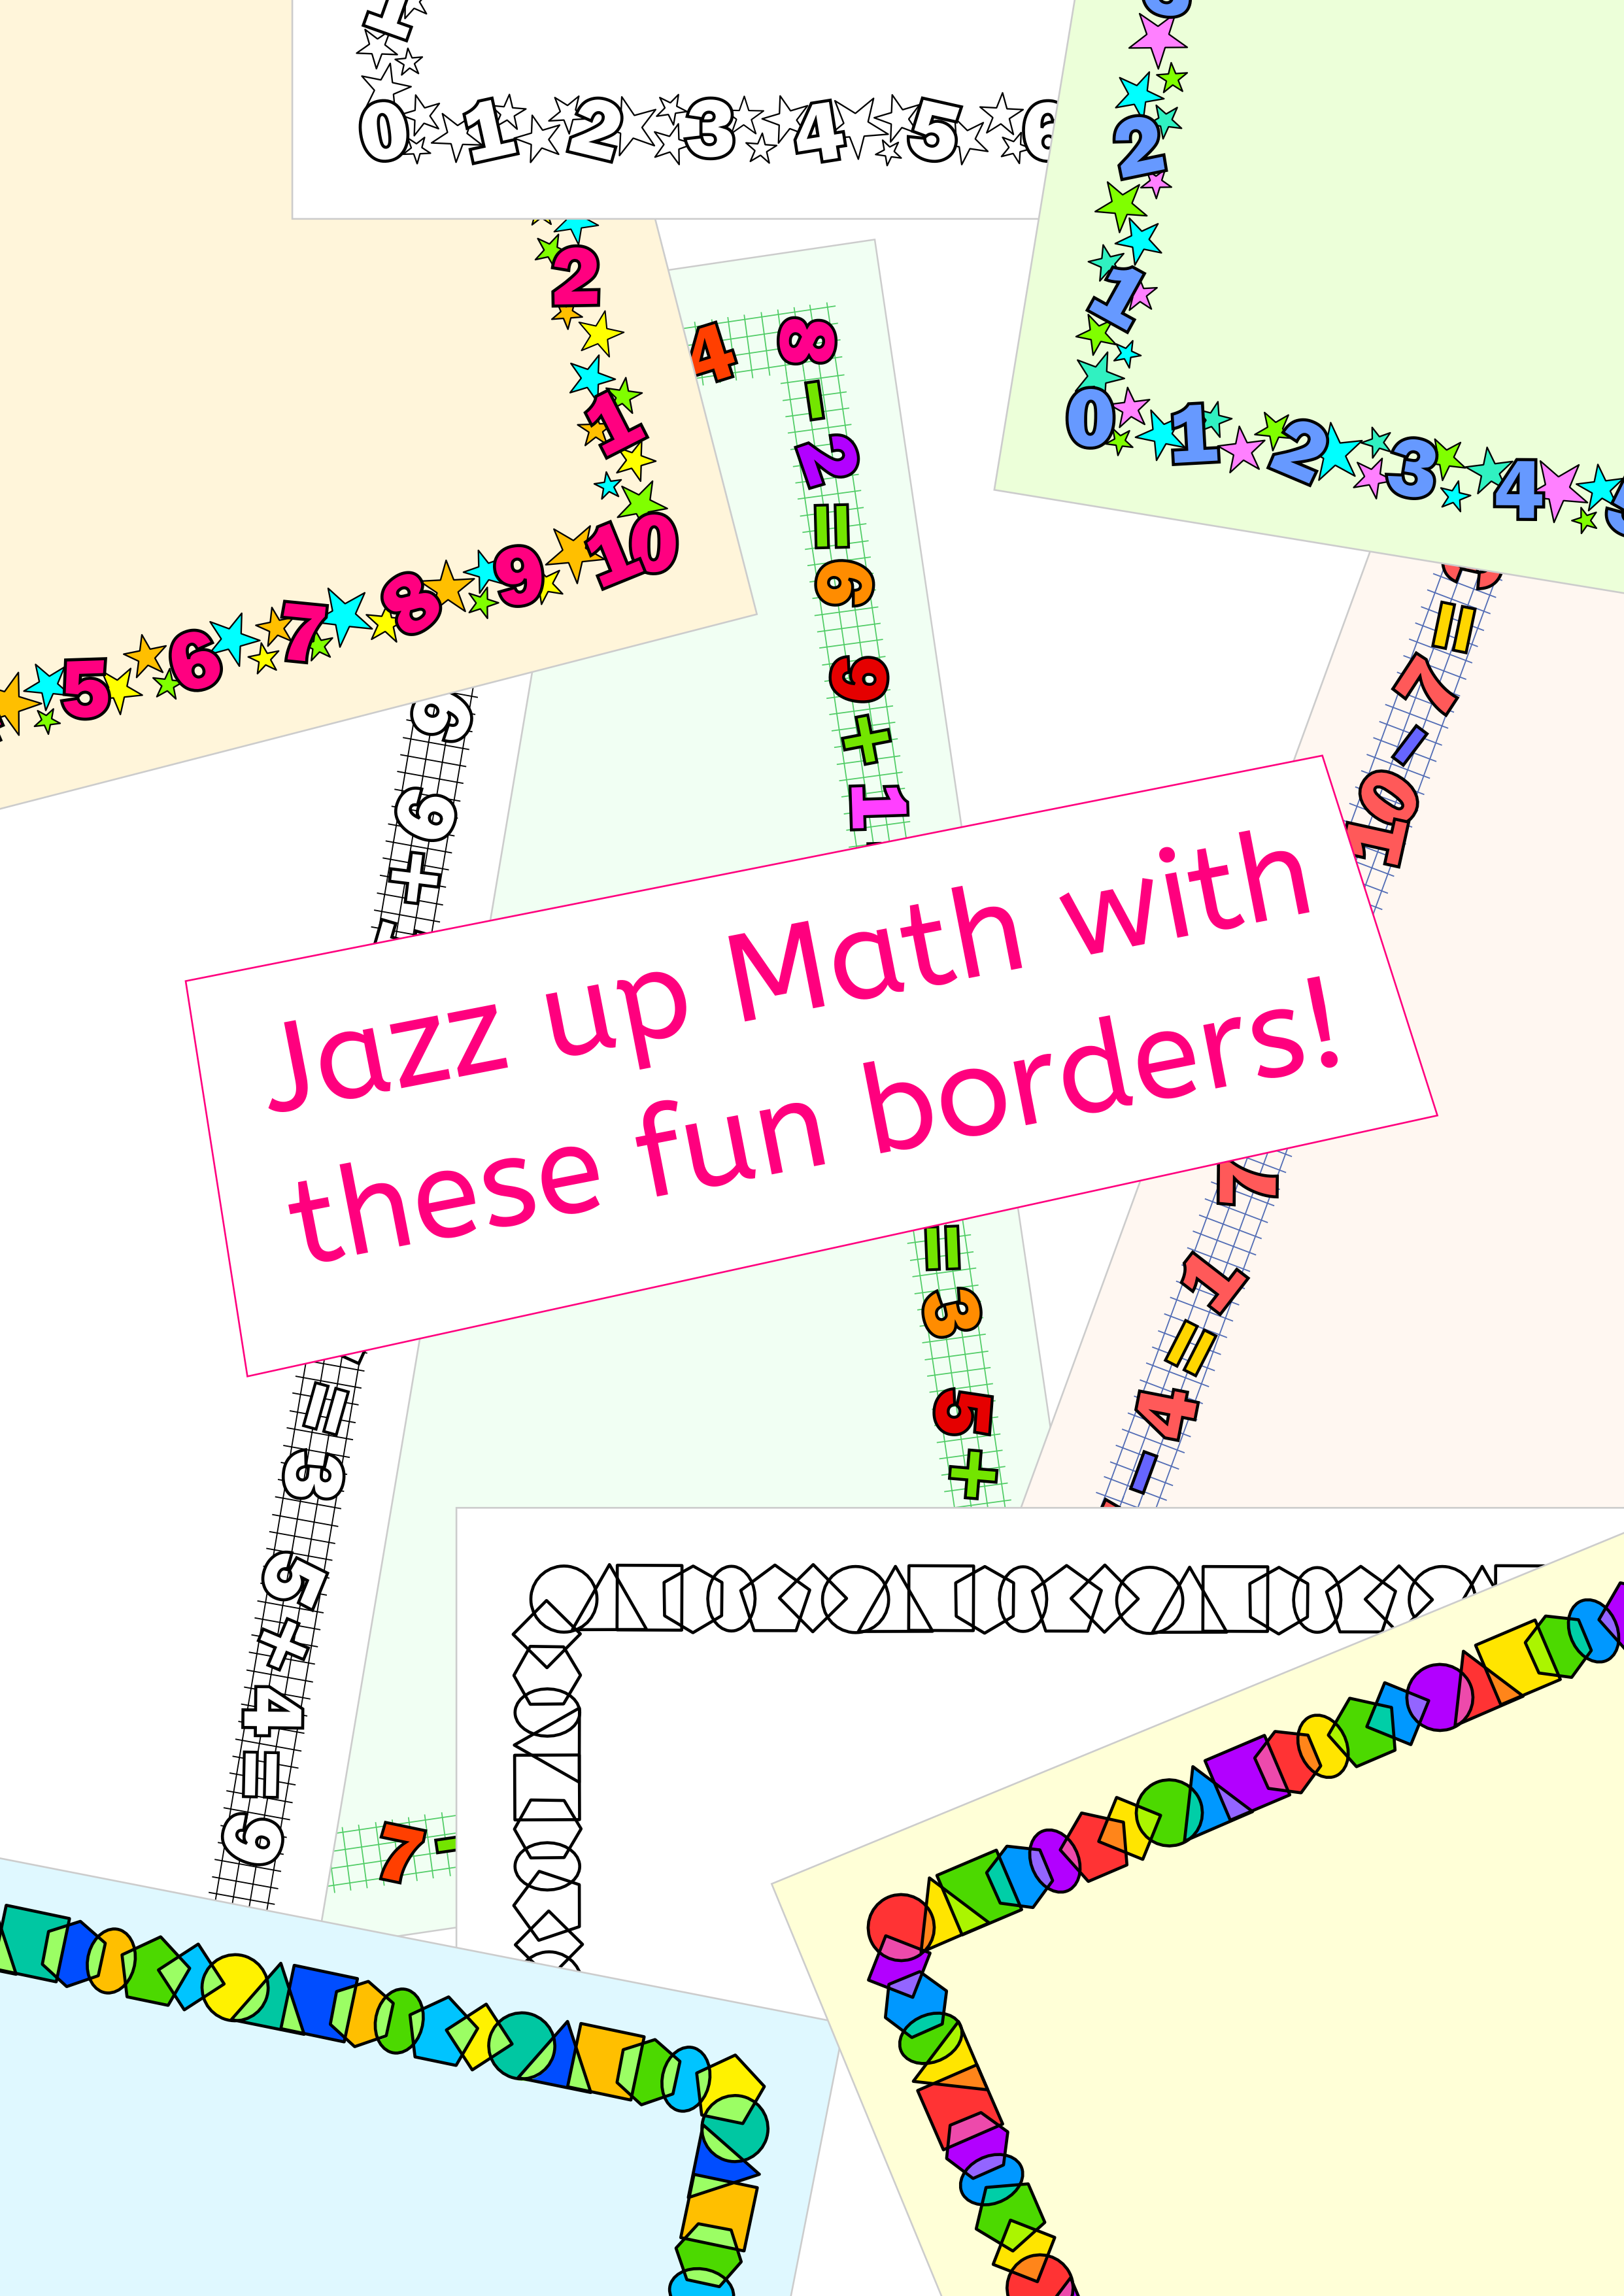 Math Borders frames for worksheets/task cards/activities | Pinterest ...